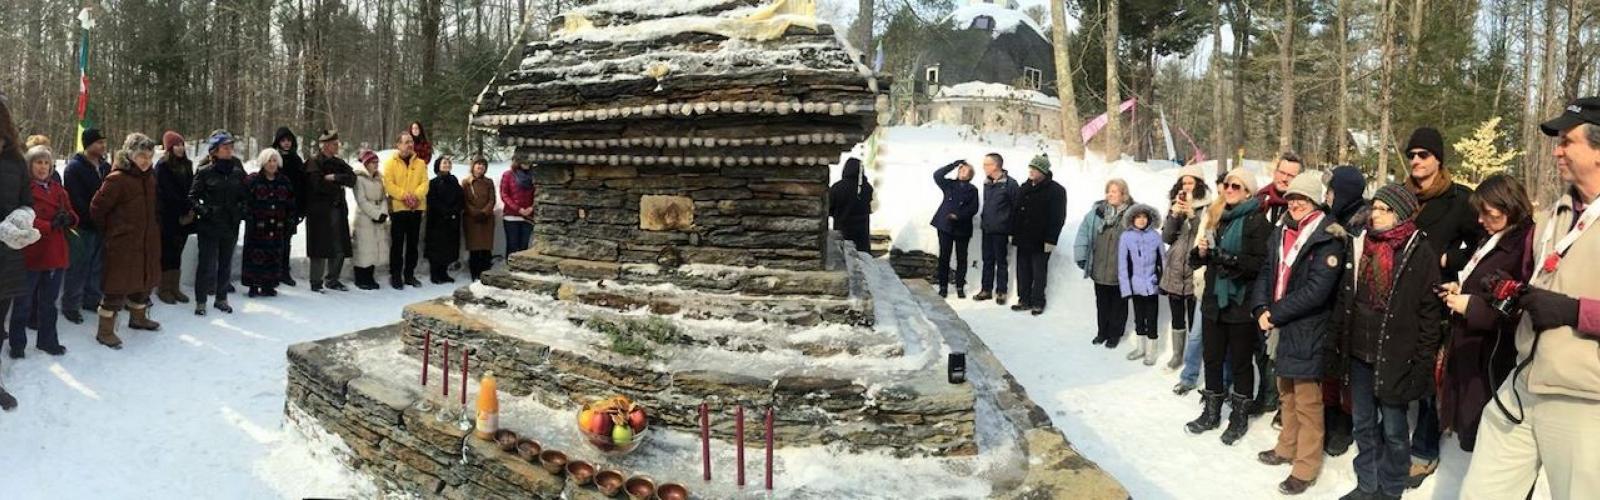 winter stupa dedication